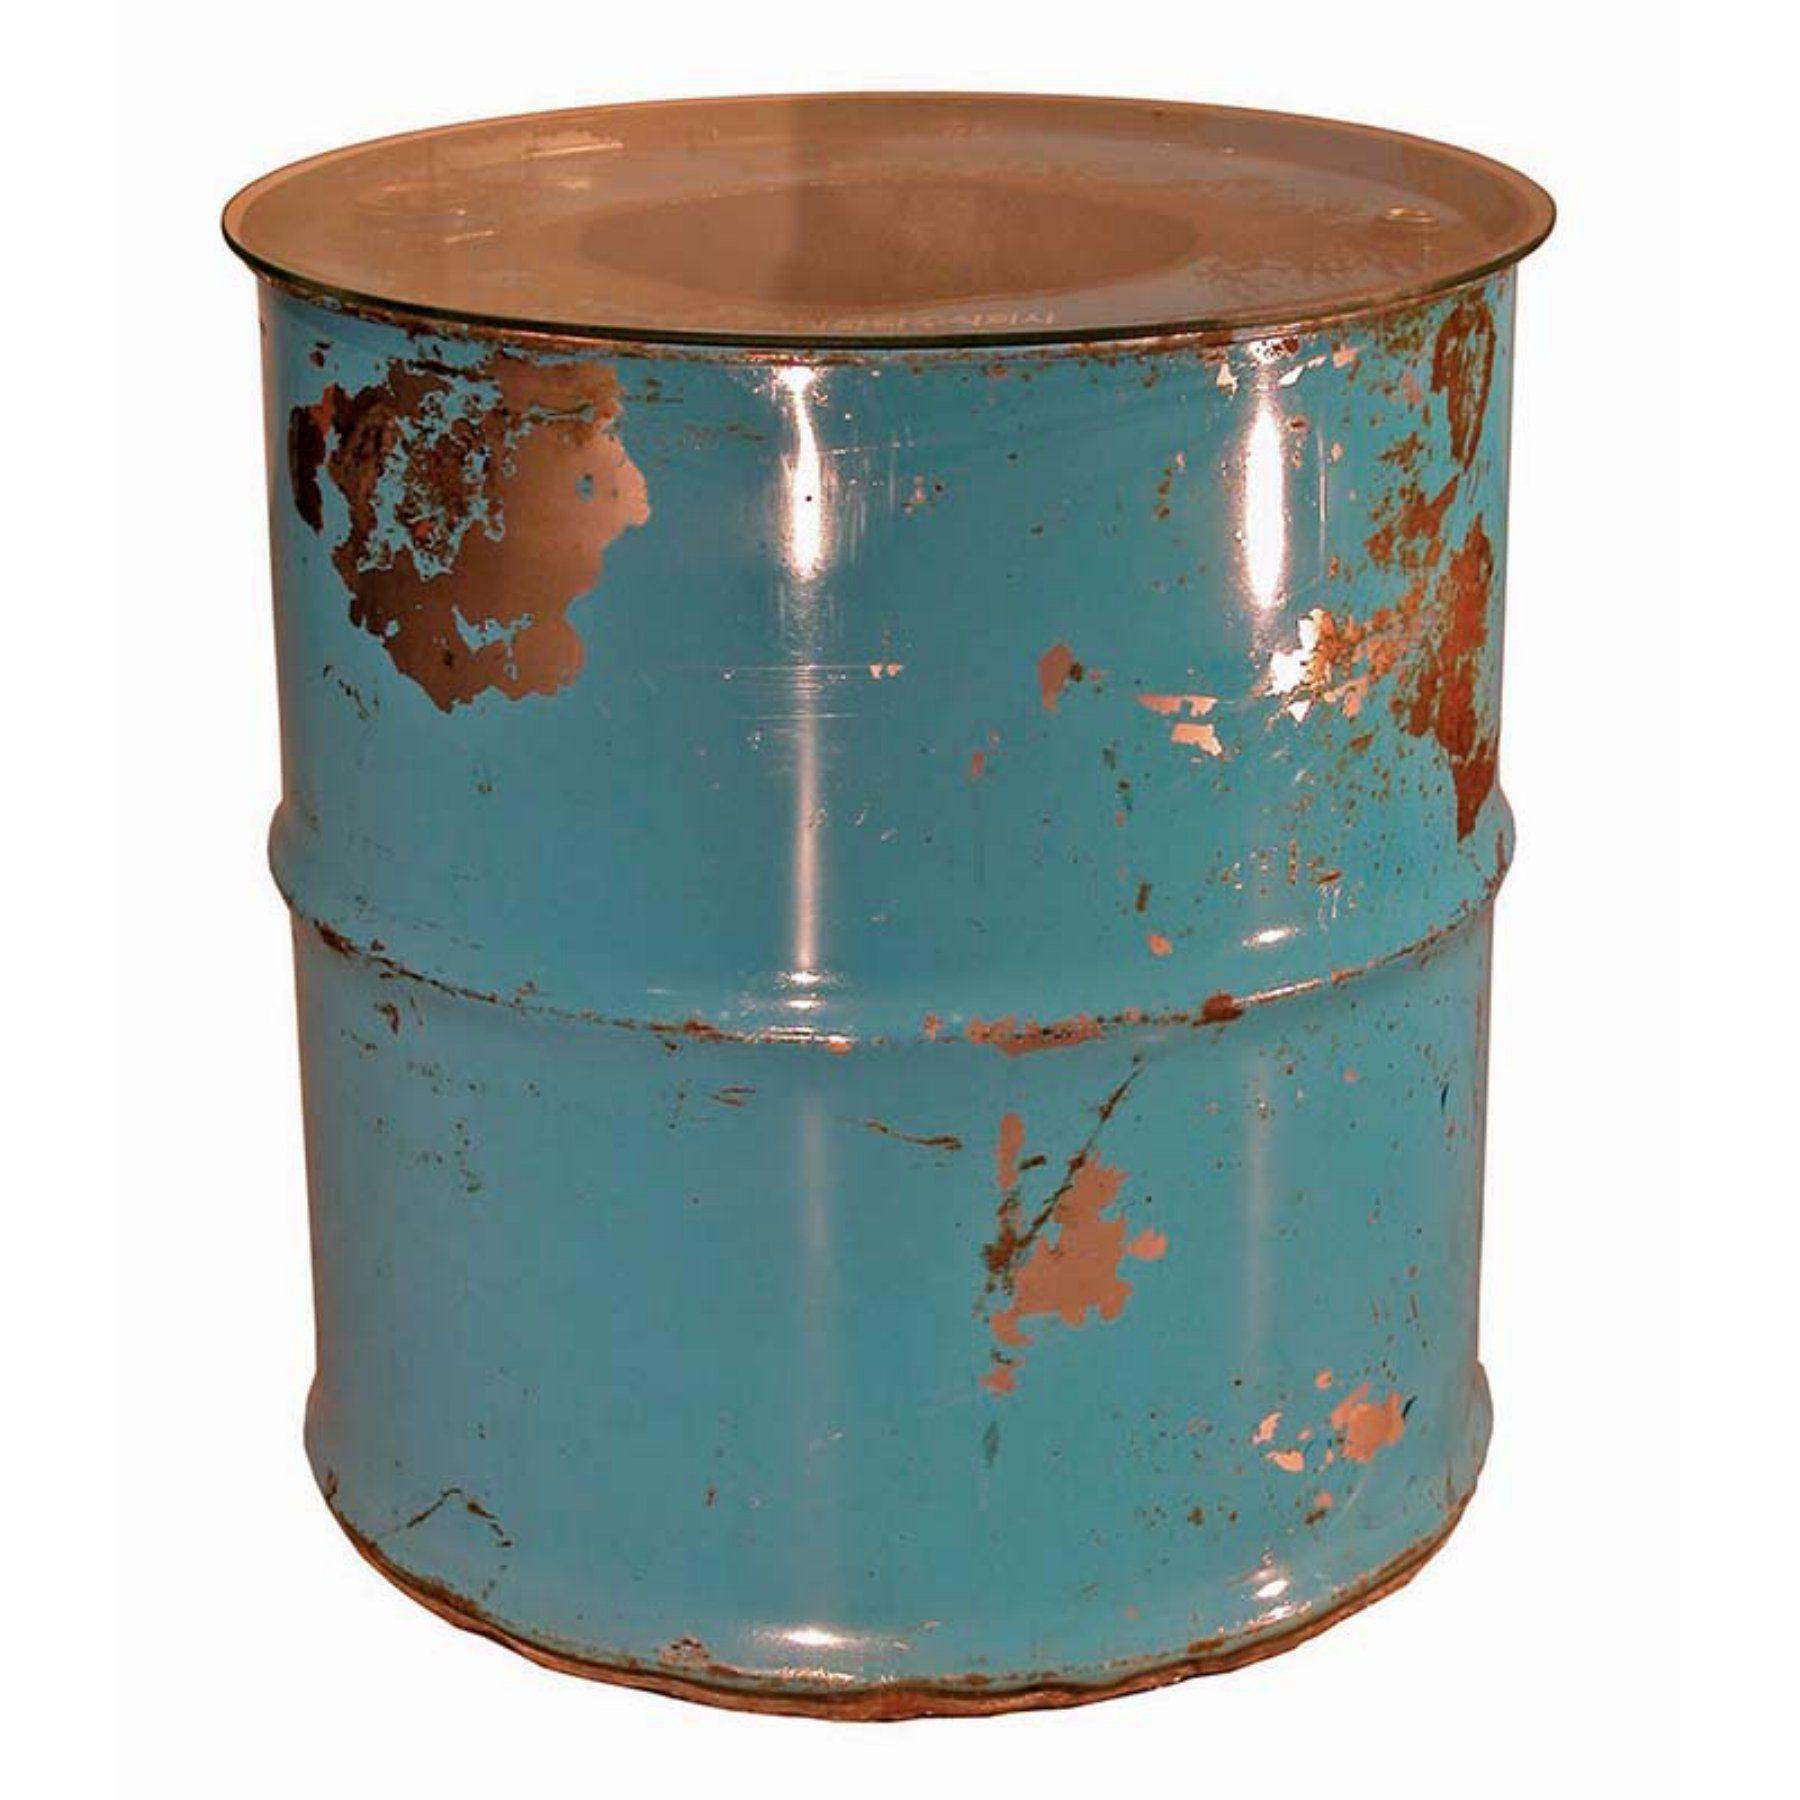 Groovystuff Moonshine Barrel End Table With Glass Top   TF 0997 24 BU